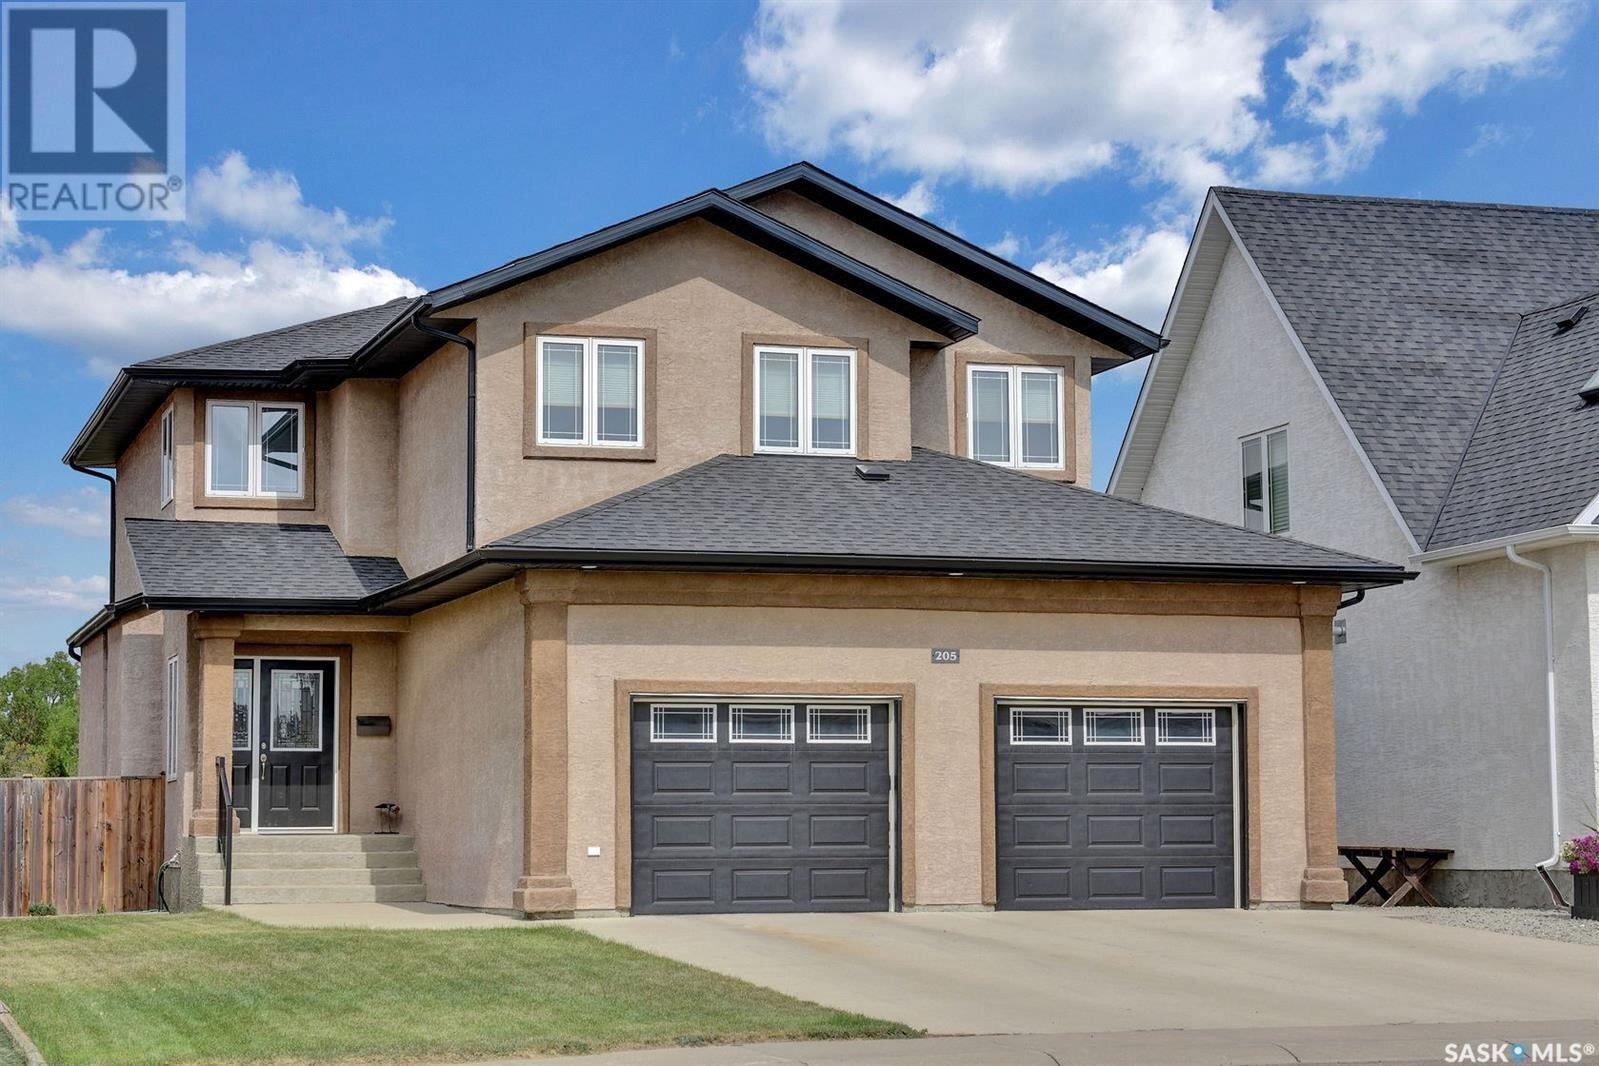 House for sale at 205 Wood Lily Dr Moose Jaw Saskatchewan - MLS: SK824010